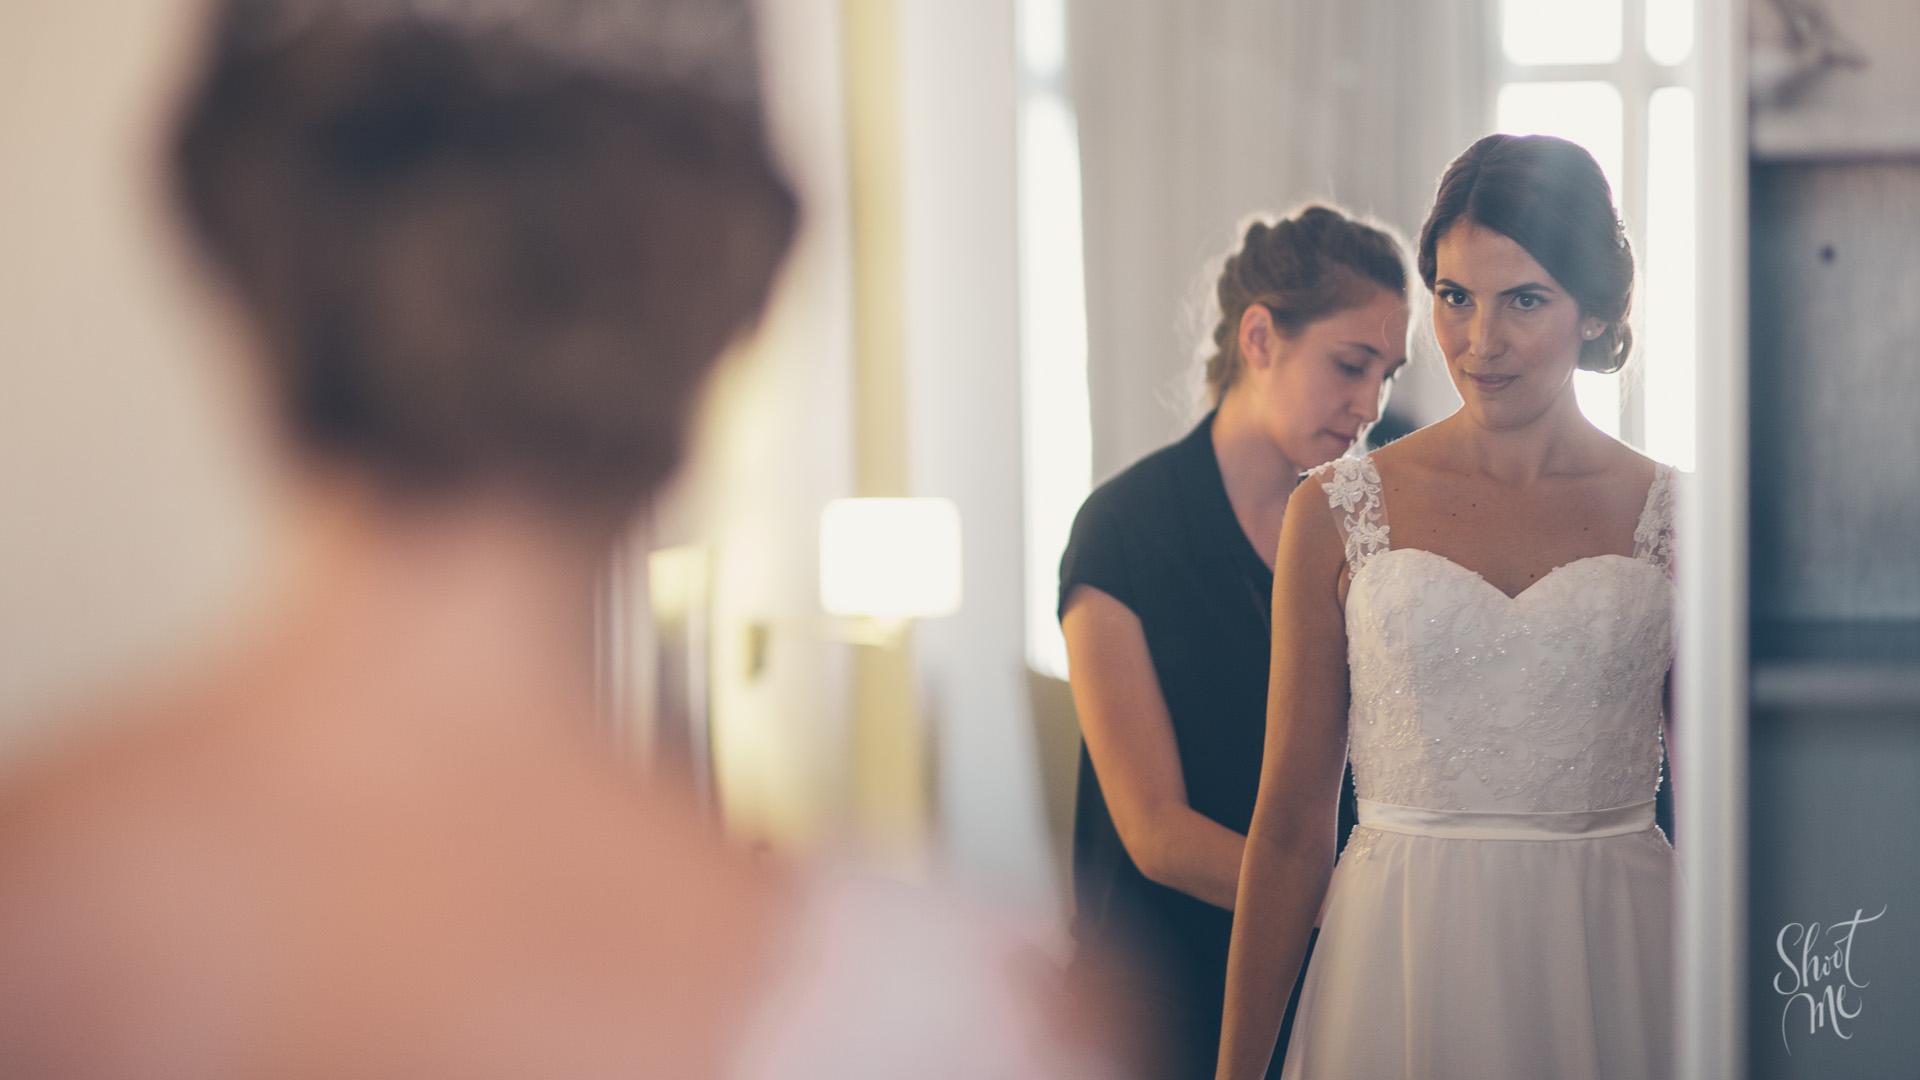 shootme - fotografo de casamientos en bahia blanca